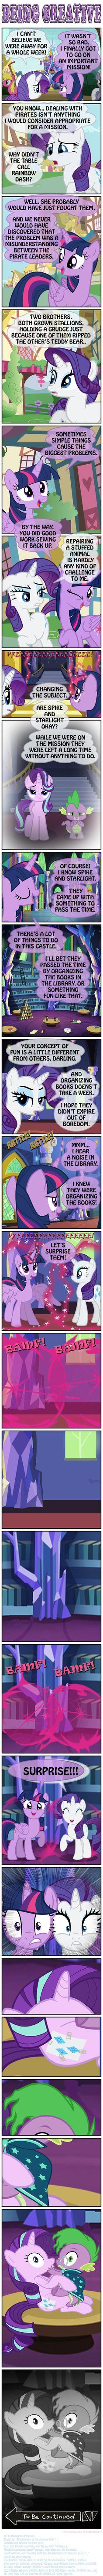 #1374075 - artist:invisibleguy-ponyman, castle, caught, cherry berry, comic, implied shipping, implied sparity, implied starburst, implied straight, jojo's bizarre adventure, kissing, princess twilight, rarity, roleplay, roleplaying, royal riff, shipping, sparlight, spike, starlight glimmer, straight, suggestive, sunburst, to be continued, twilight sparkle - Derpibooru - My Little Pony: Friendship is Magic Imageboard